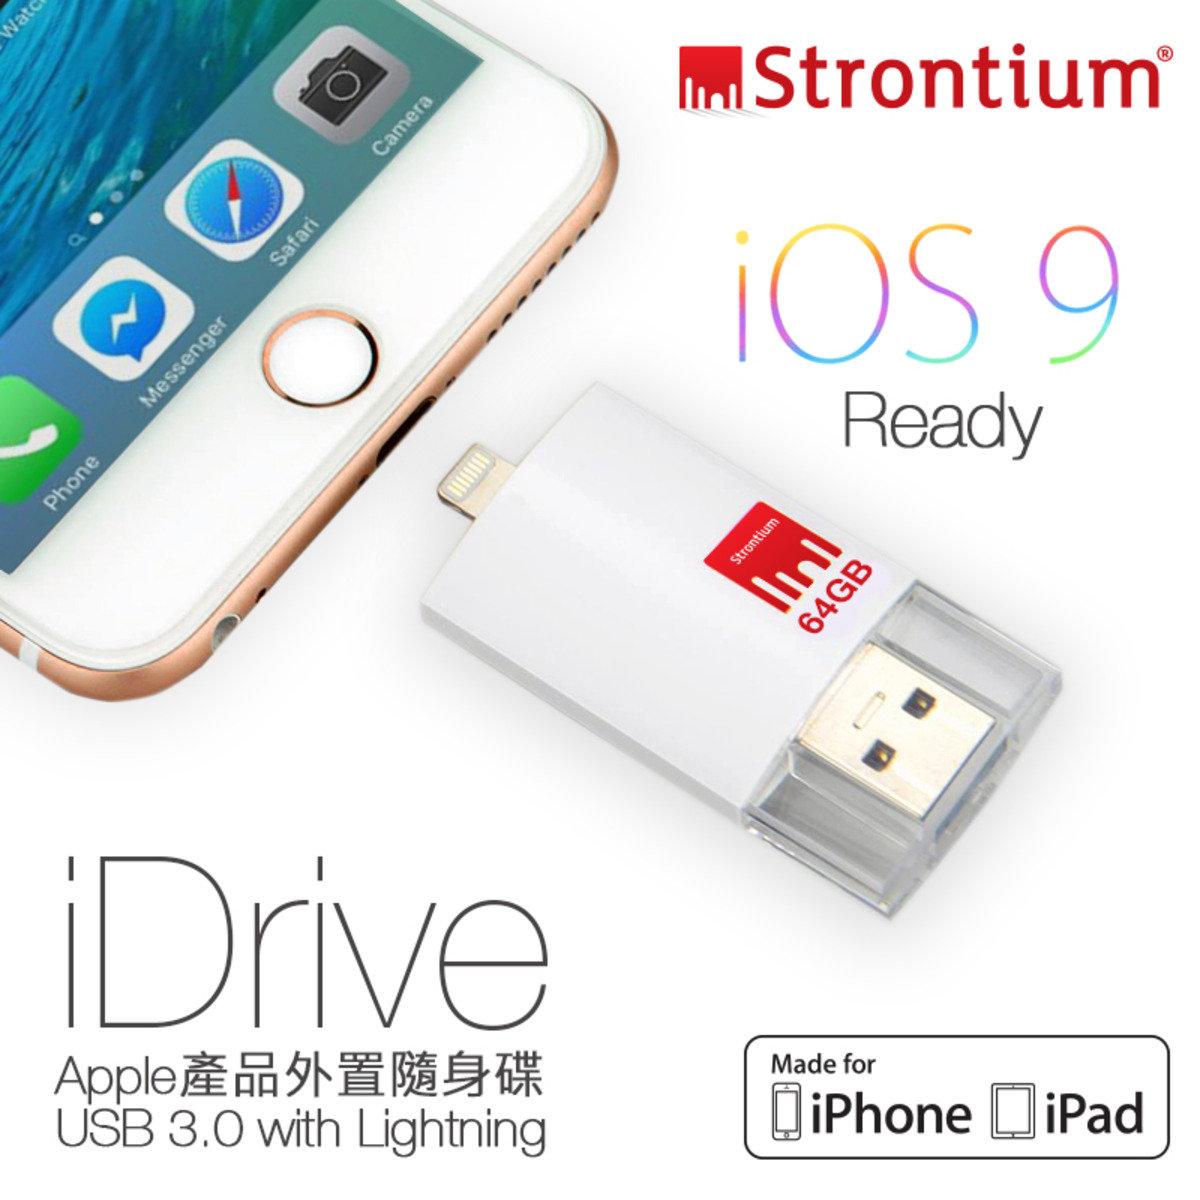 NITRO iDrive OTG 64G 85MB/s USB 3.0 高速雙用隨身碟 (iPhone & iPad專用)